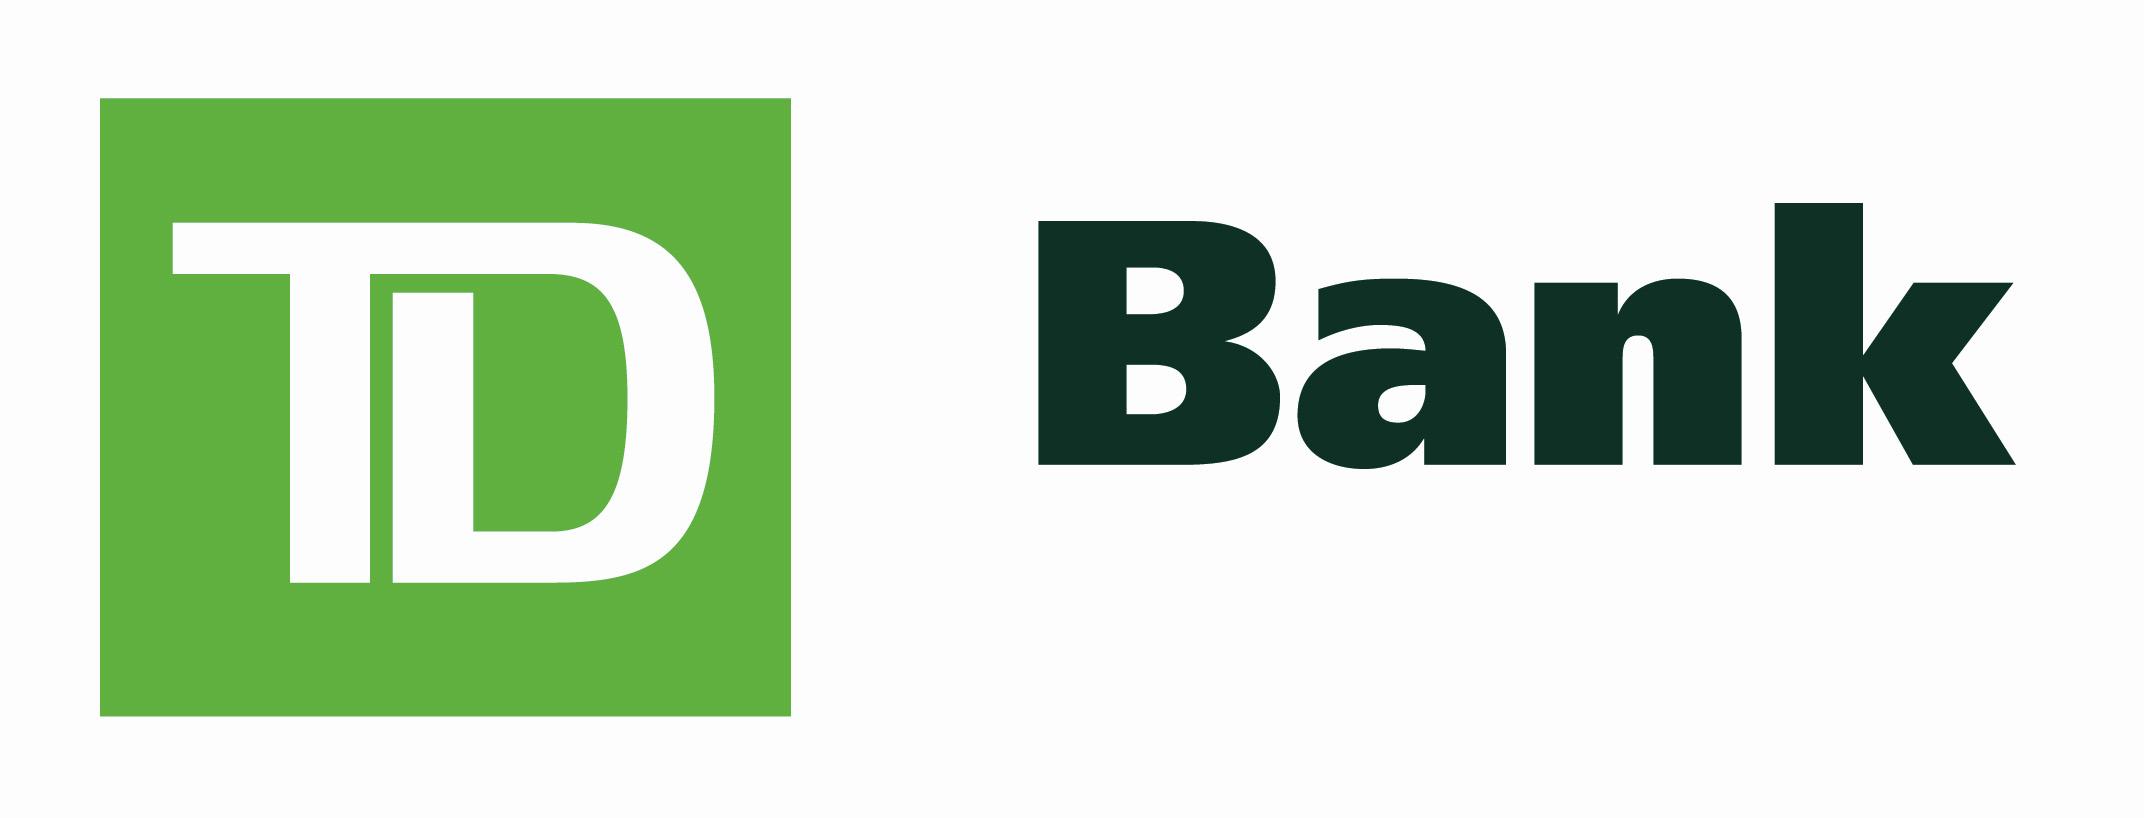 bank logos - photo #13